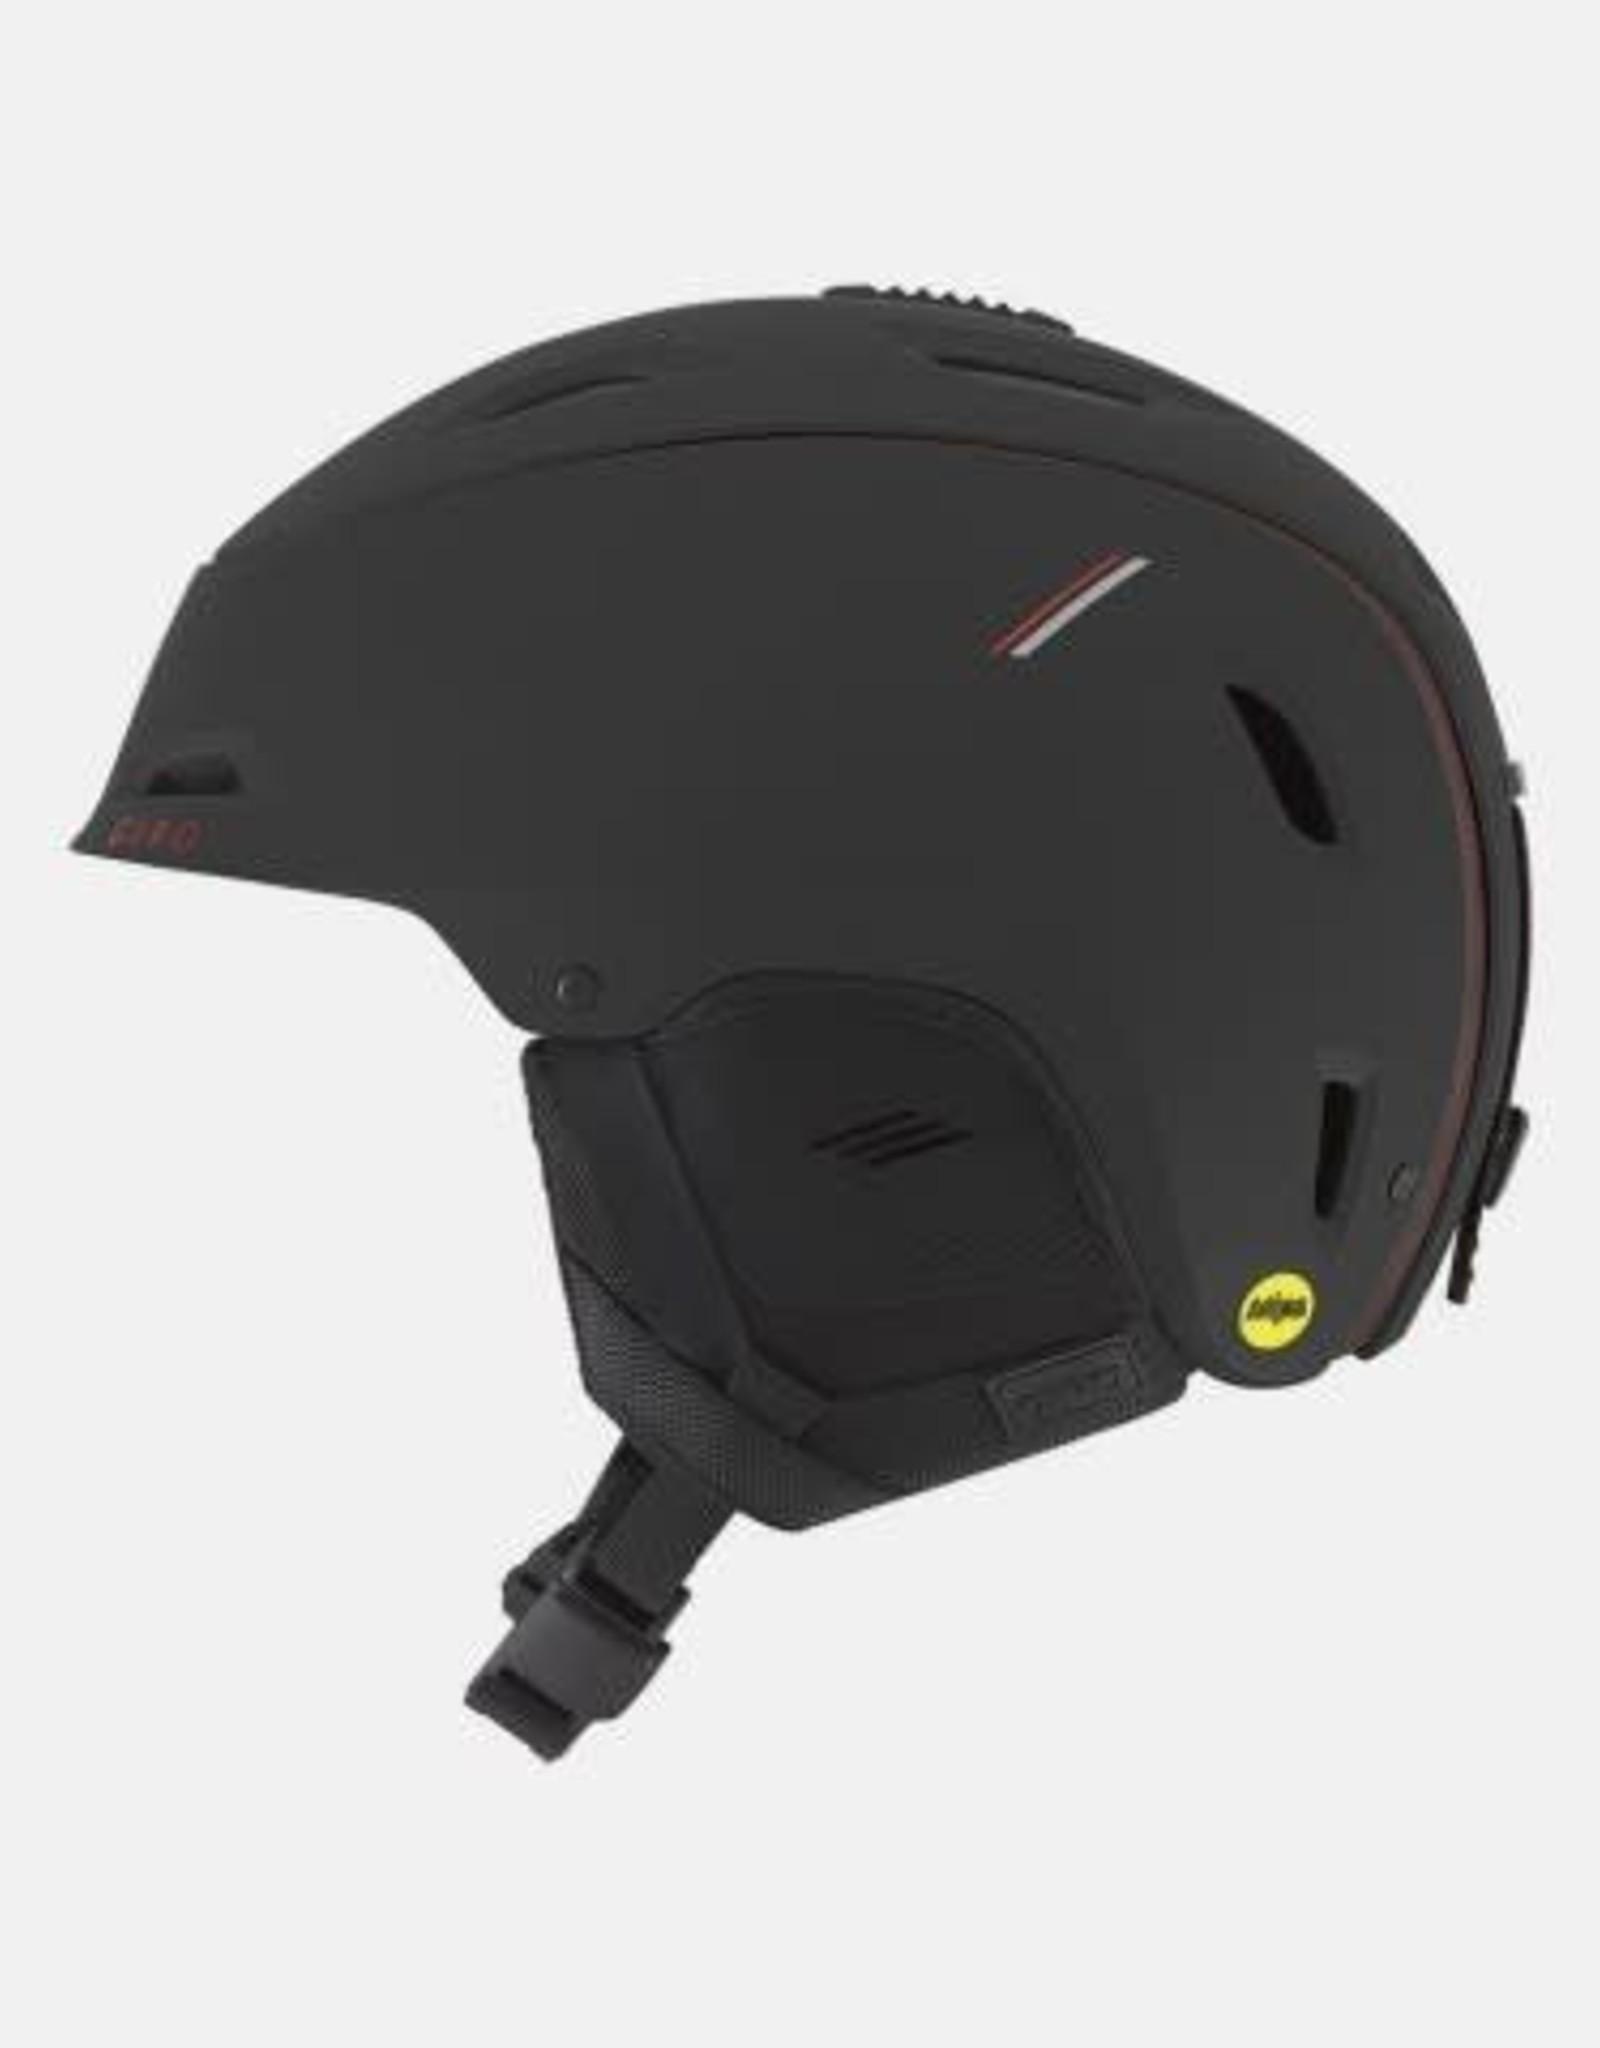 Giro MIPS Range Helmet